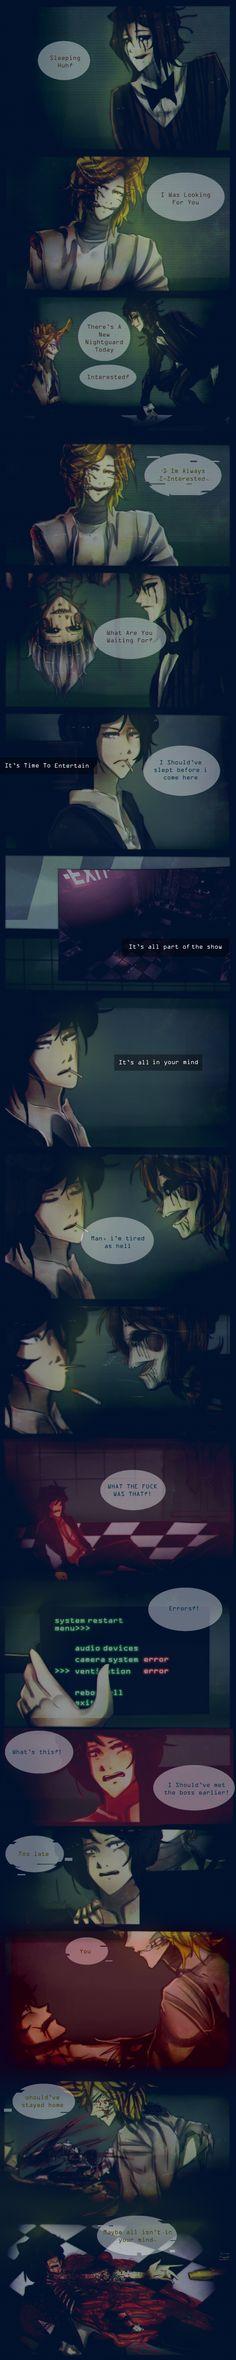 .: Lost [FNaF AU Comic] Page 7 :. by Ailurophile-Chan